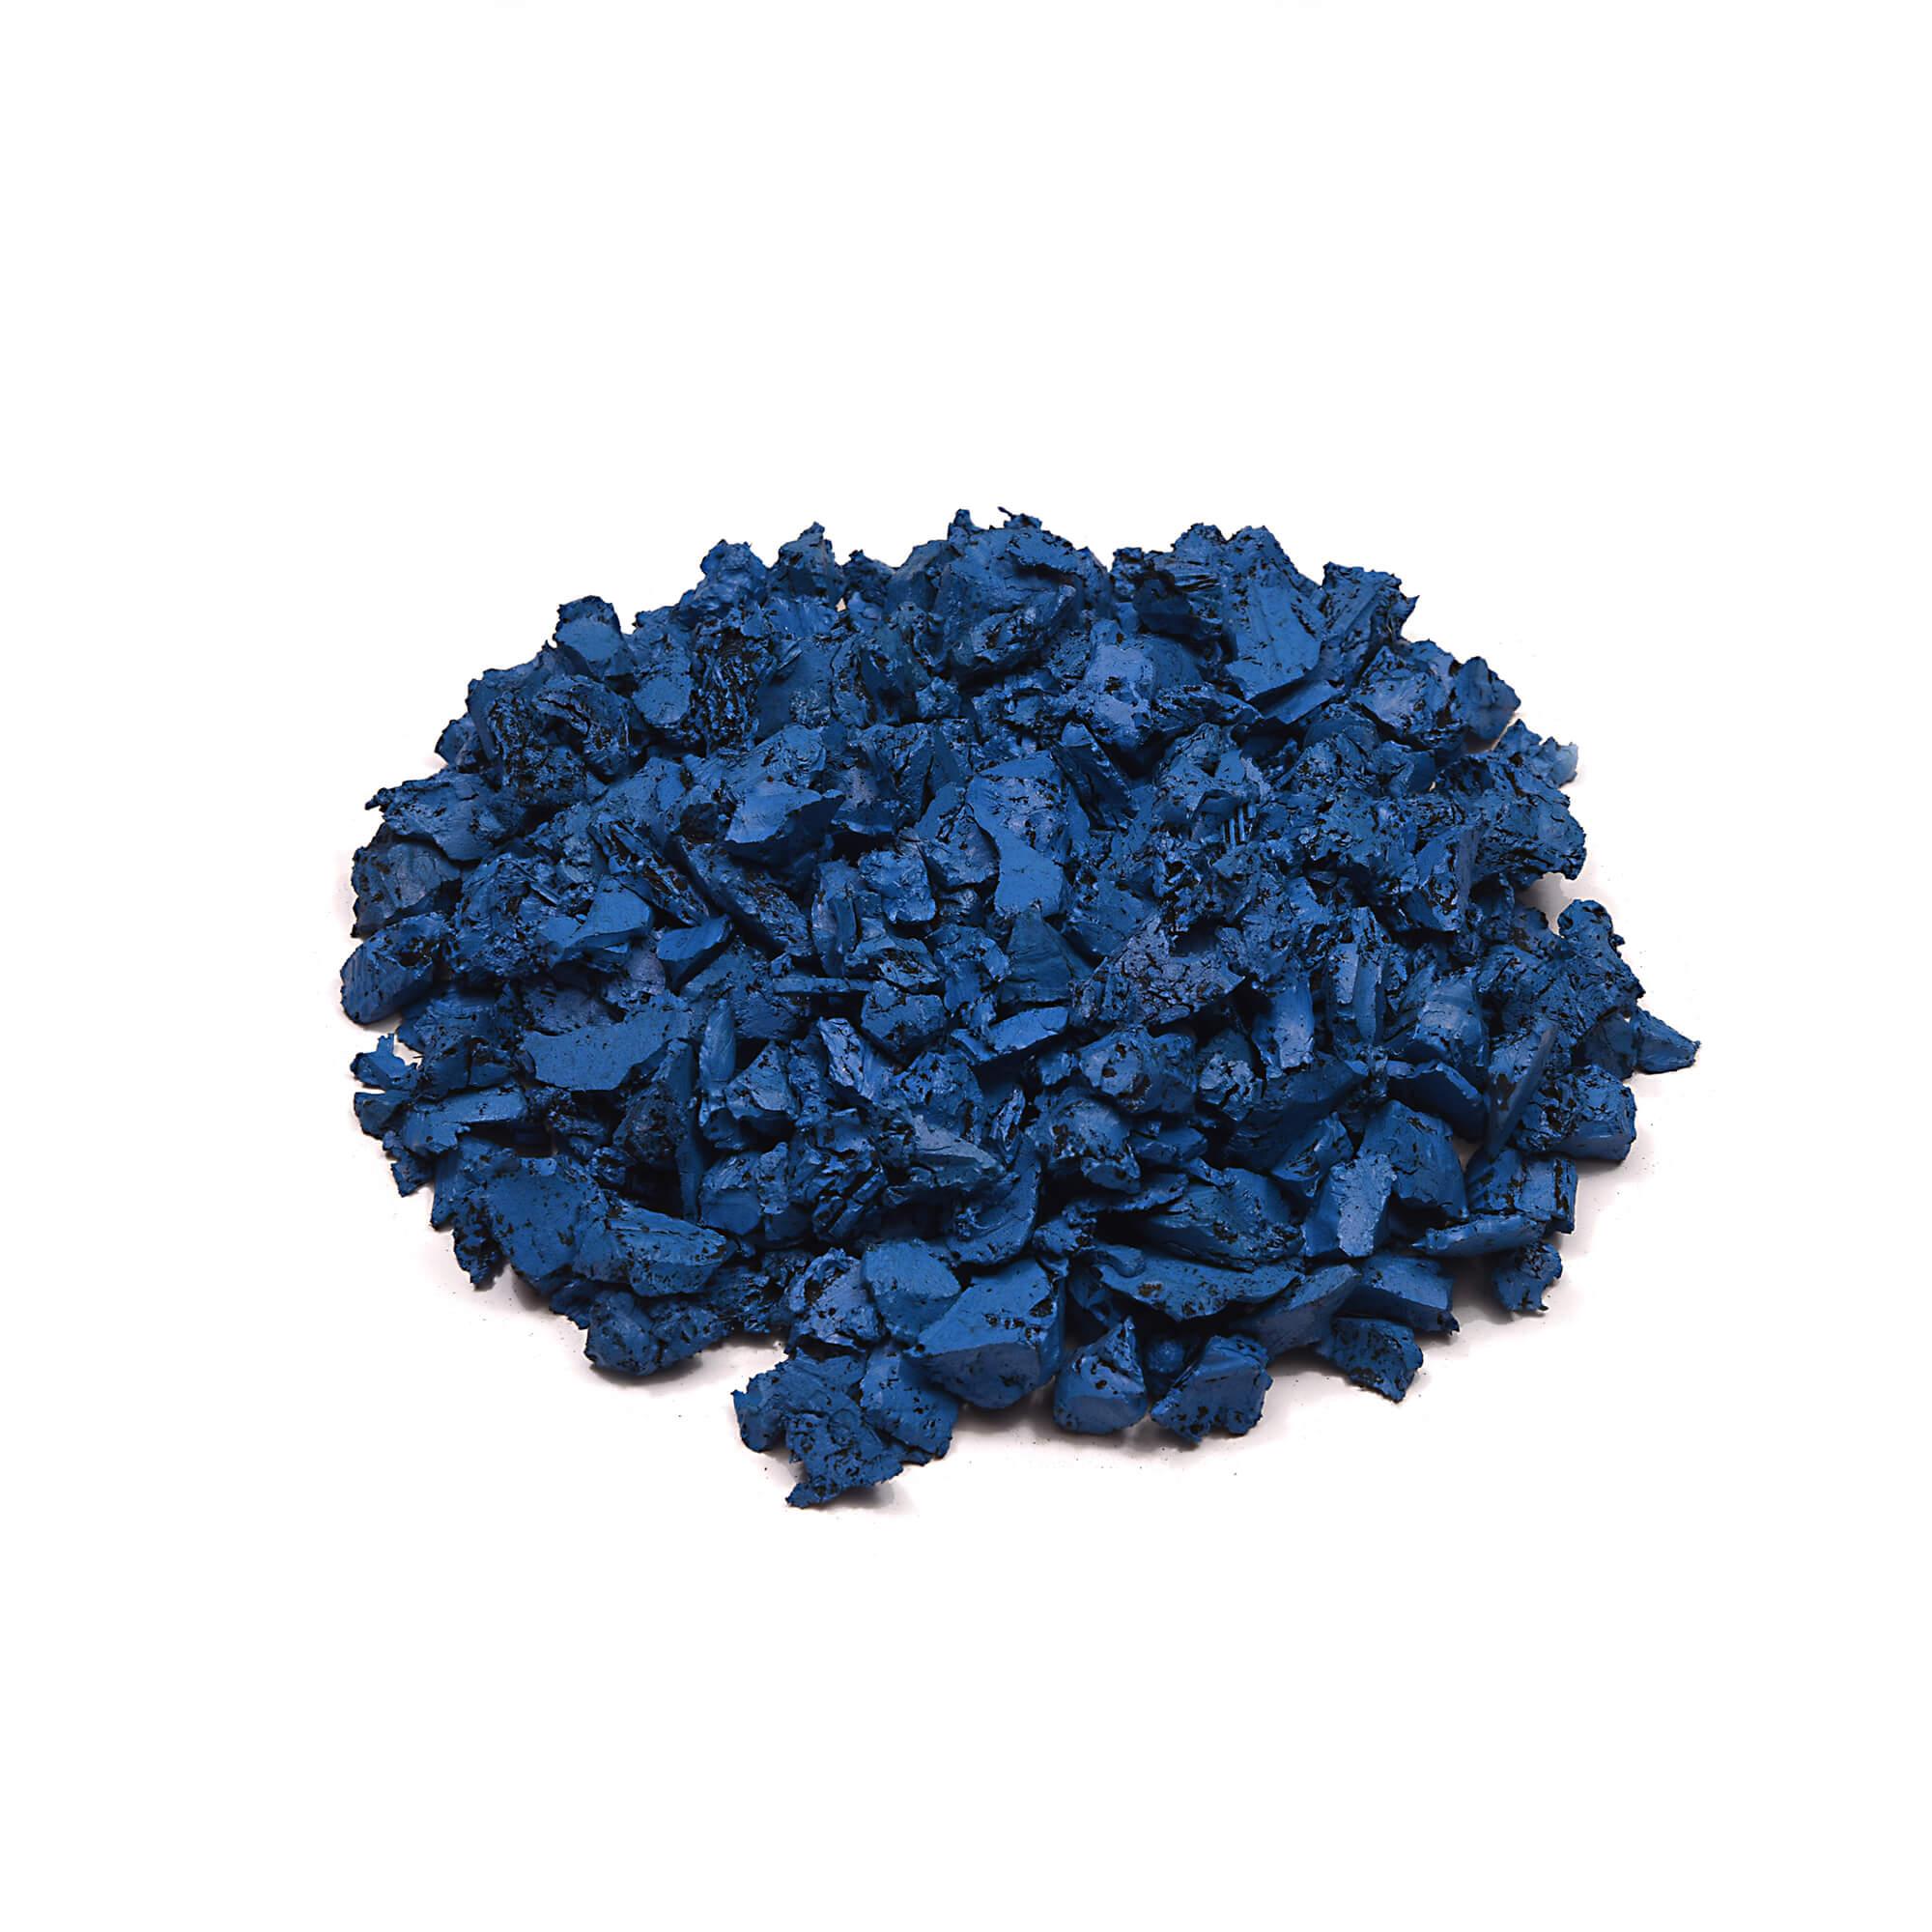 Caribbean Blue rubber mulch